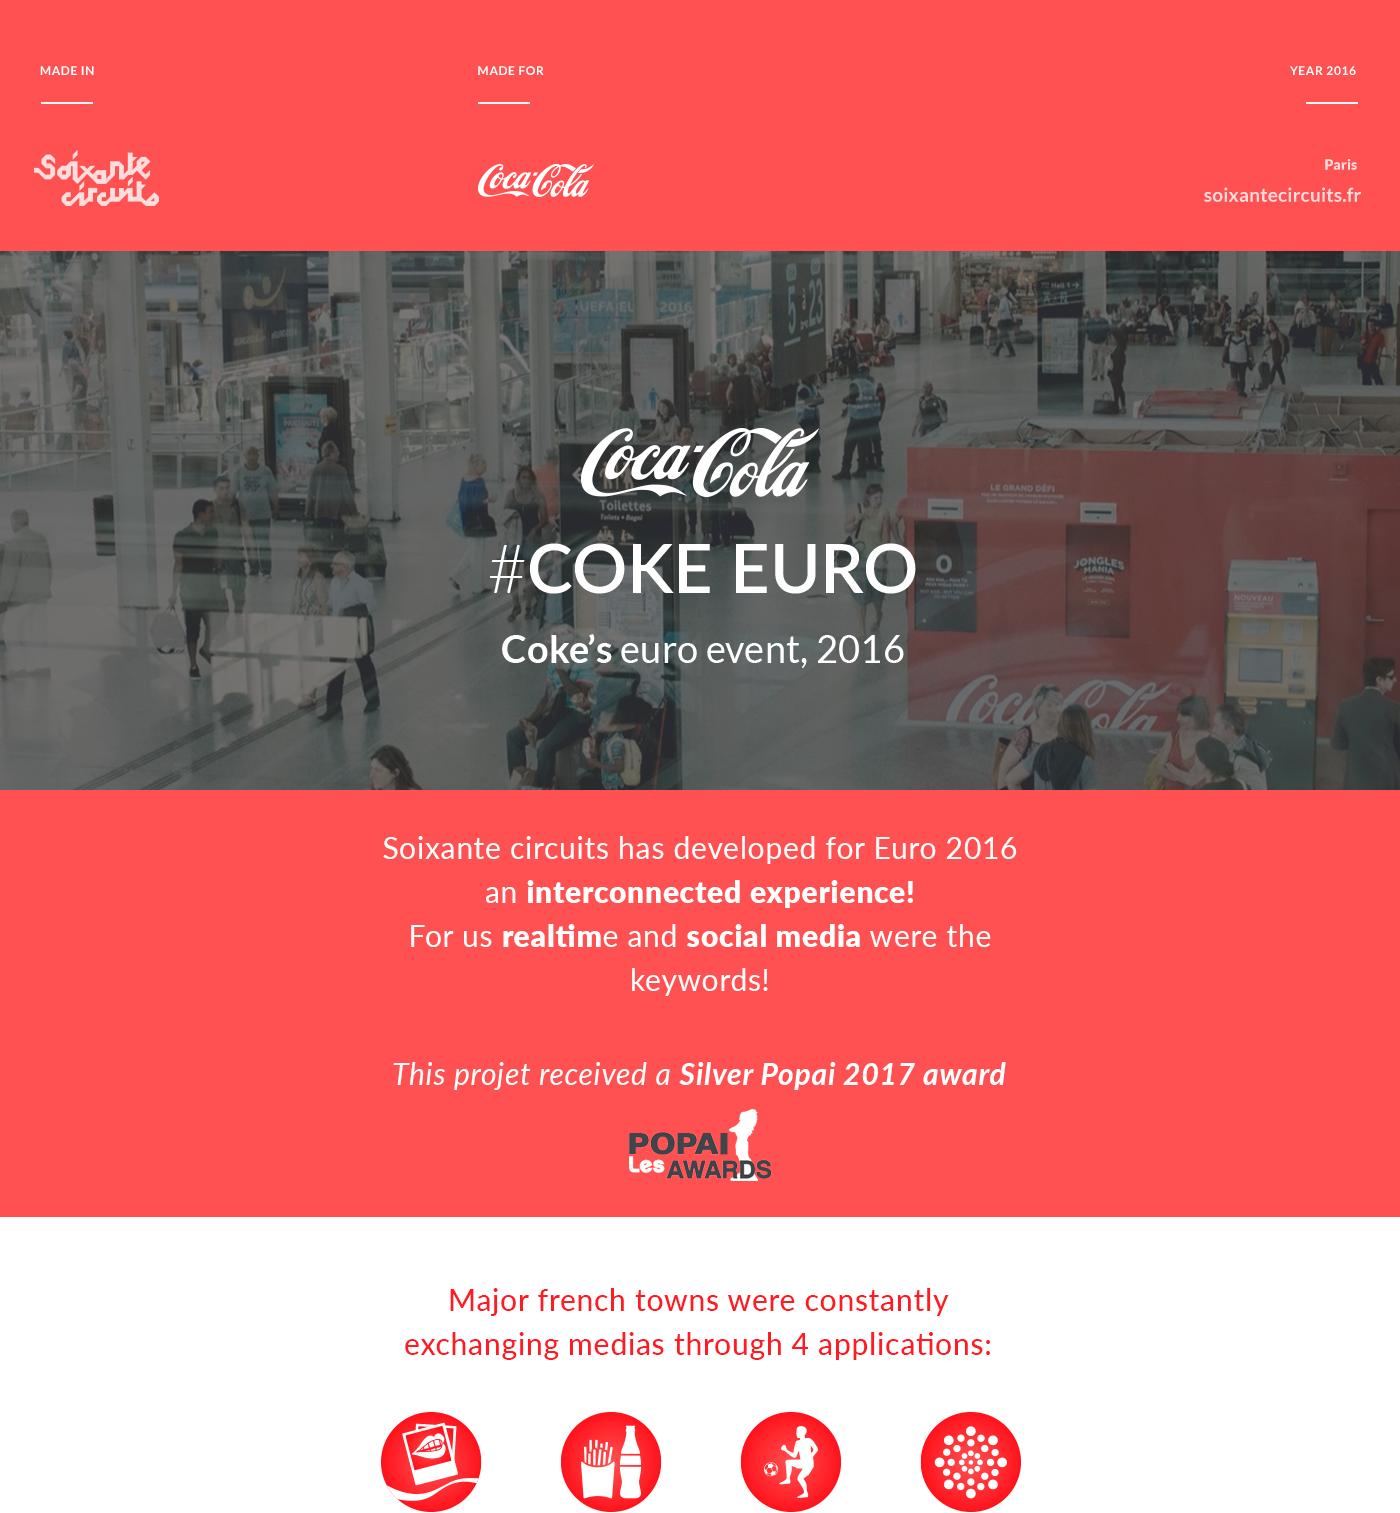 interaction coke euro Photobooth game